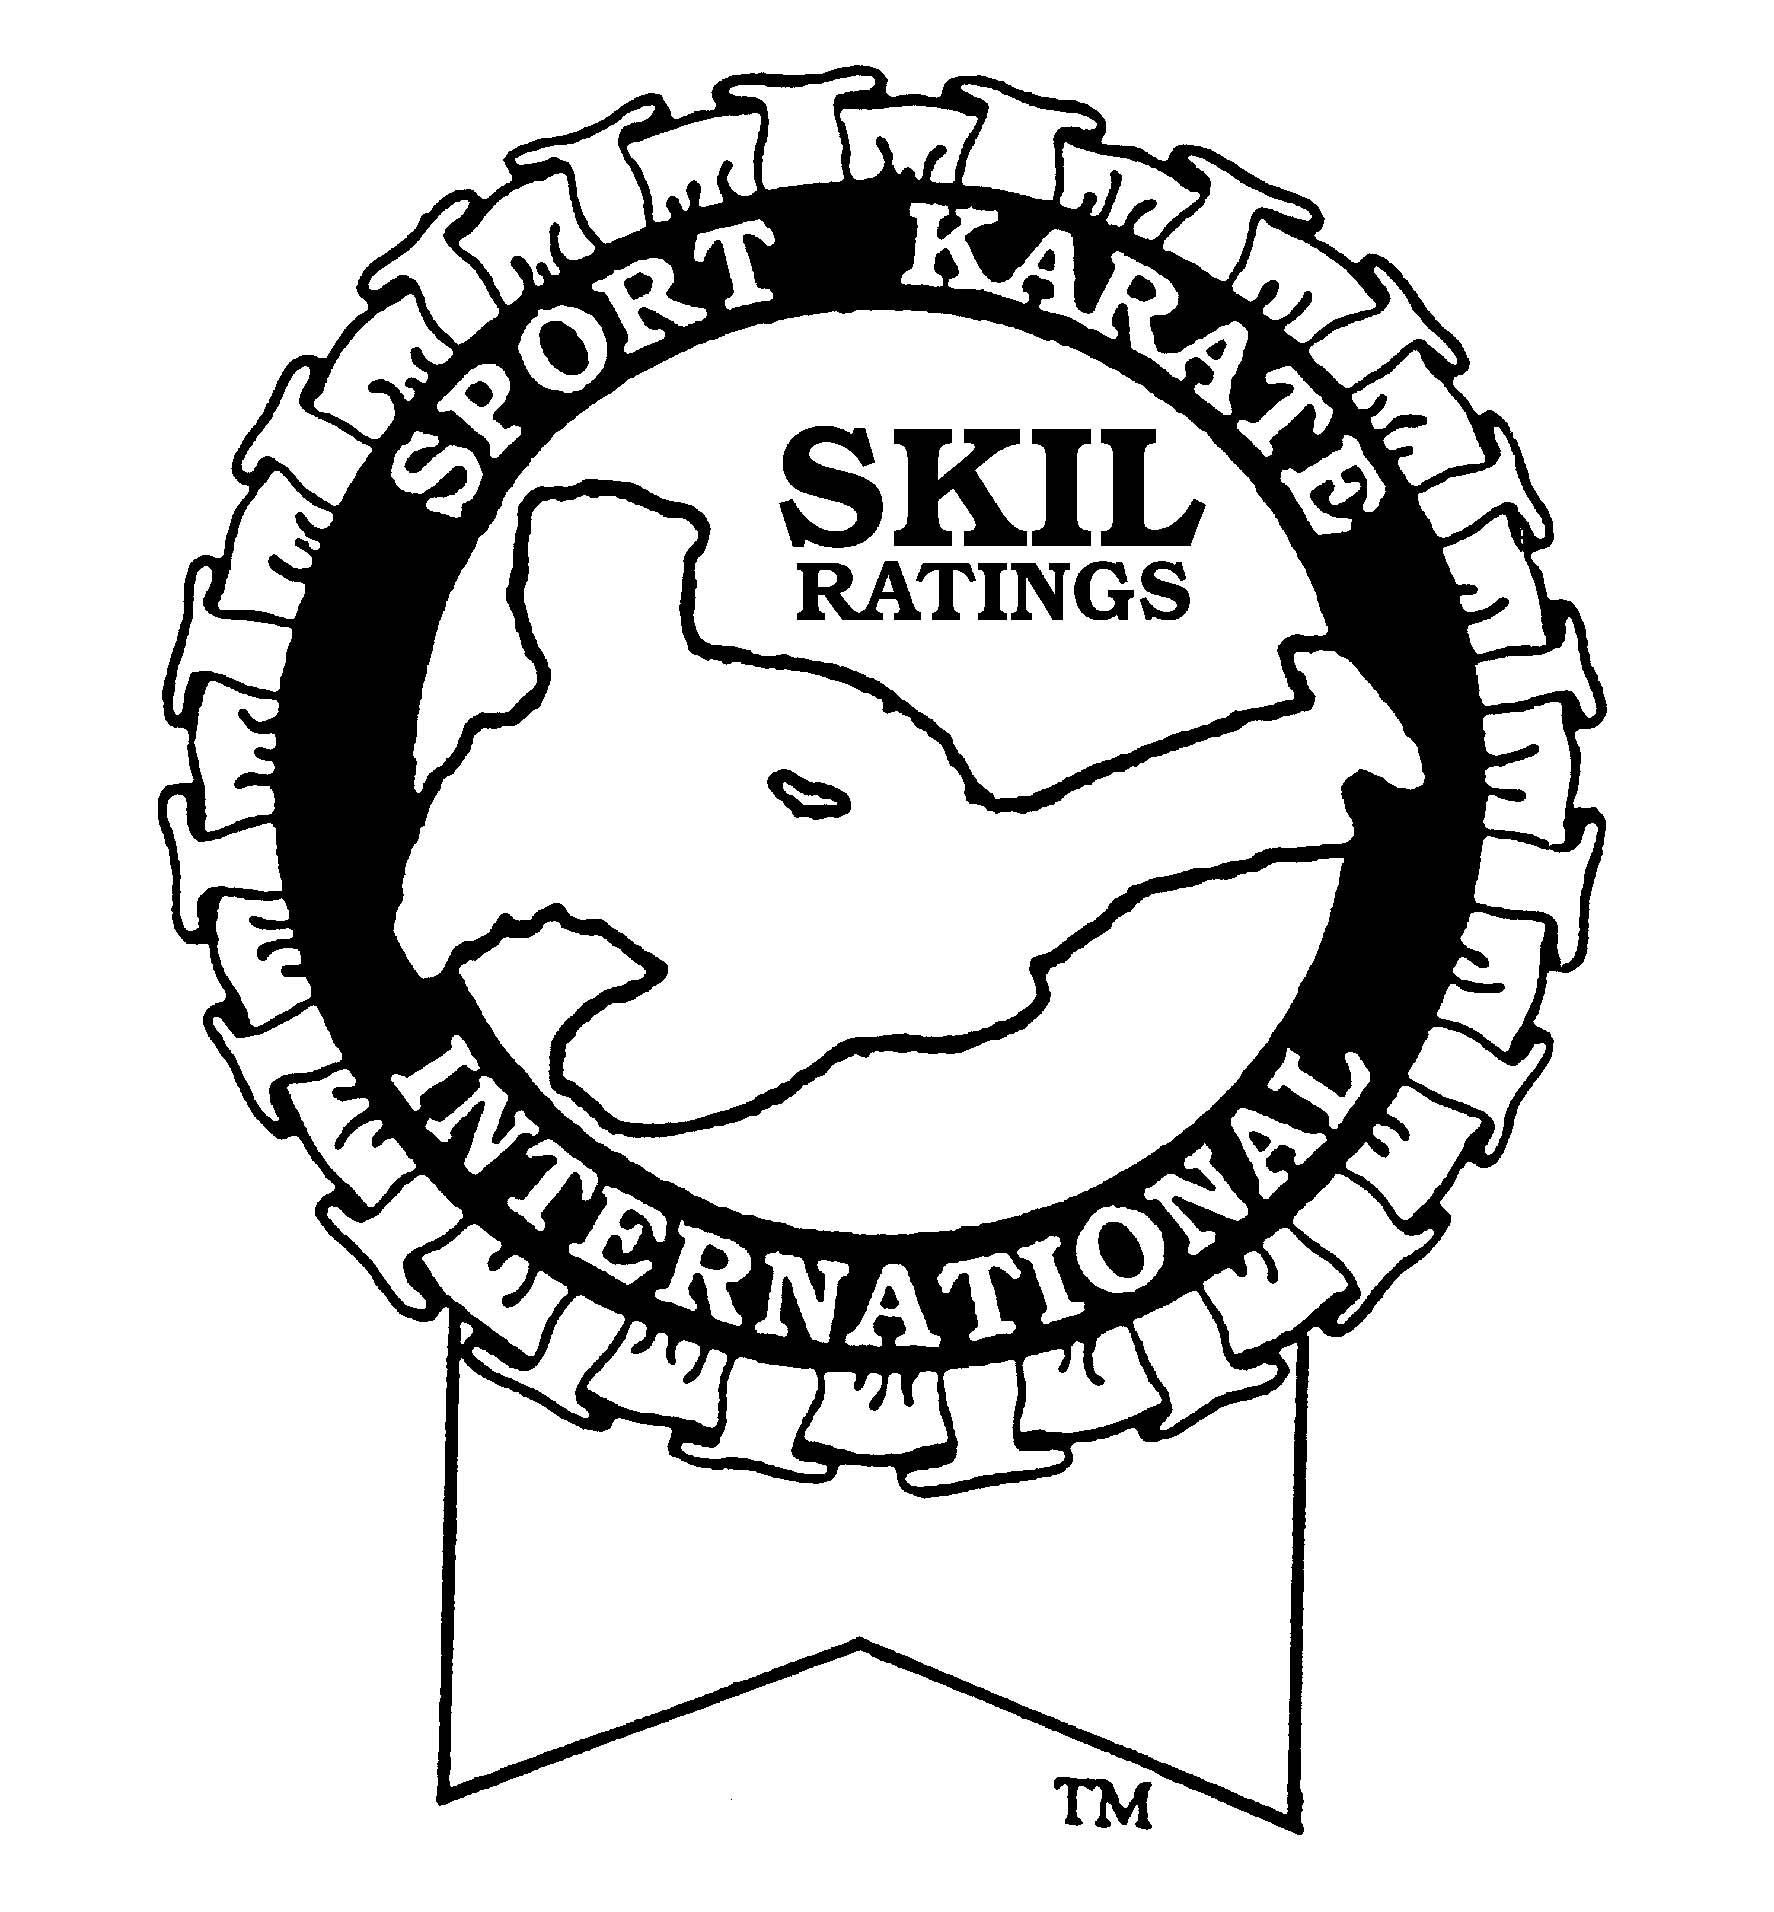 skil logo. skil logo #1 skil